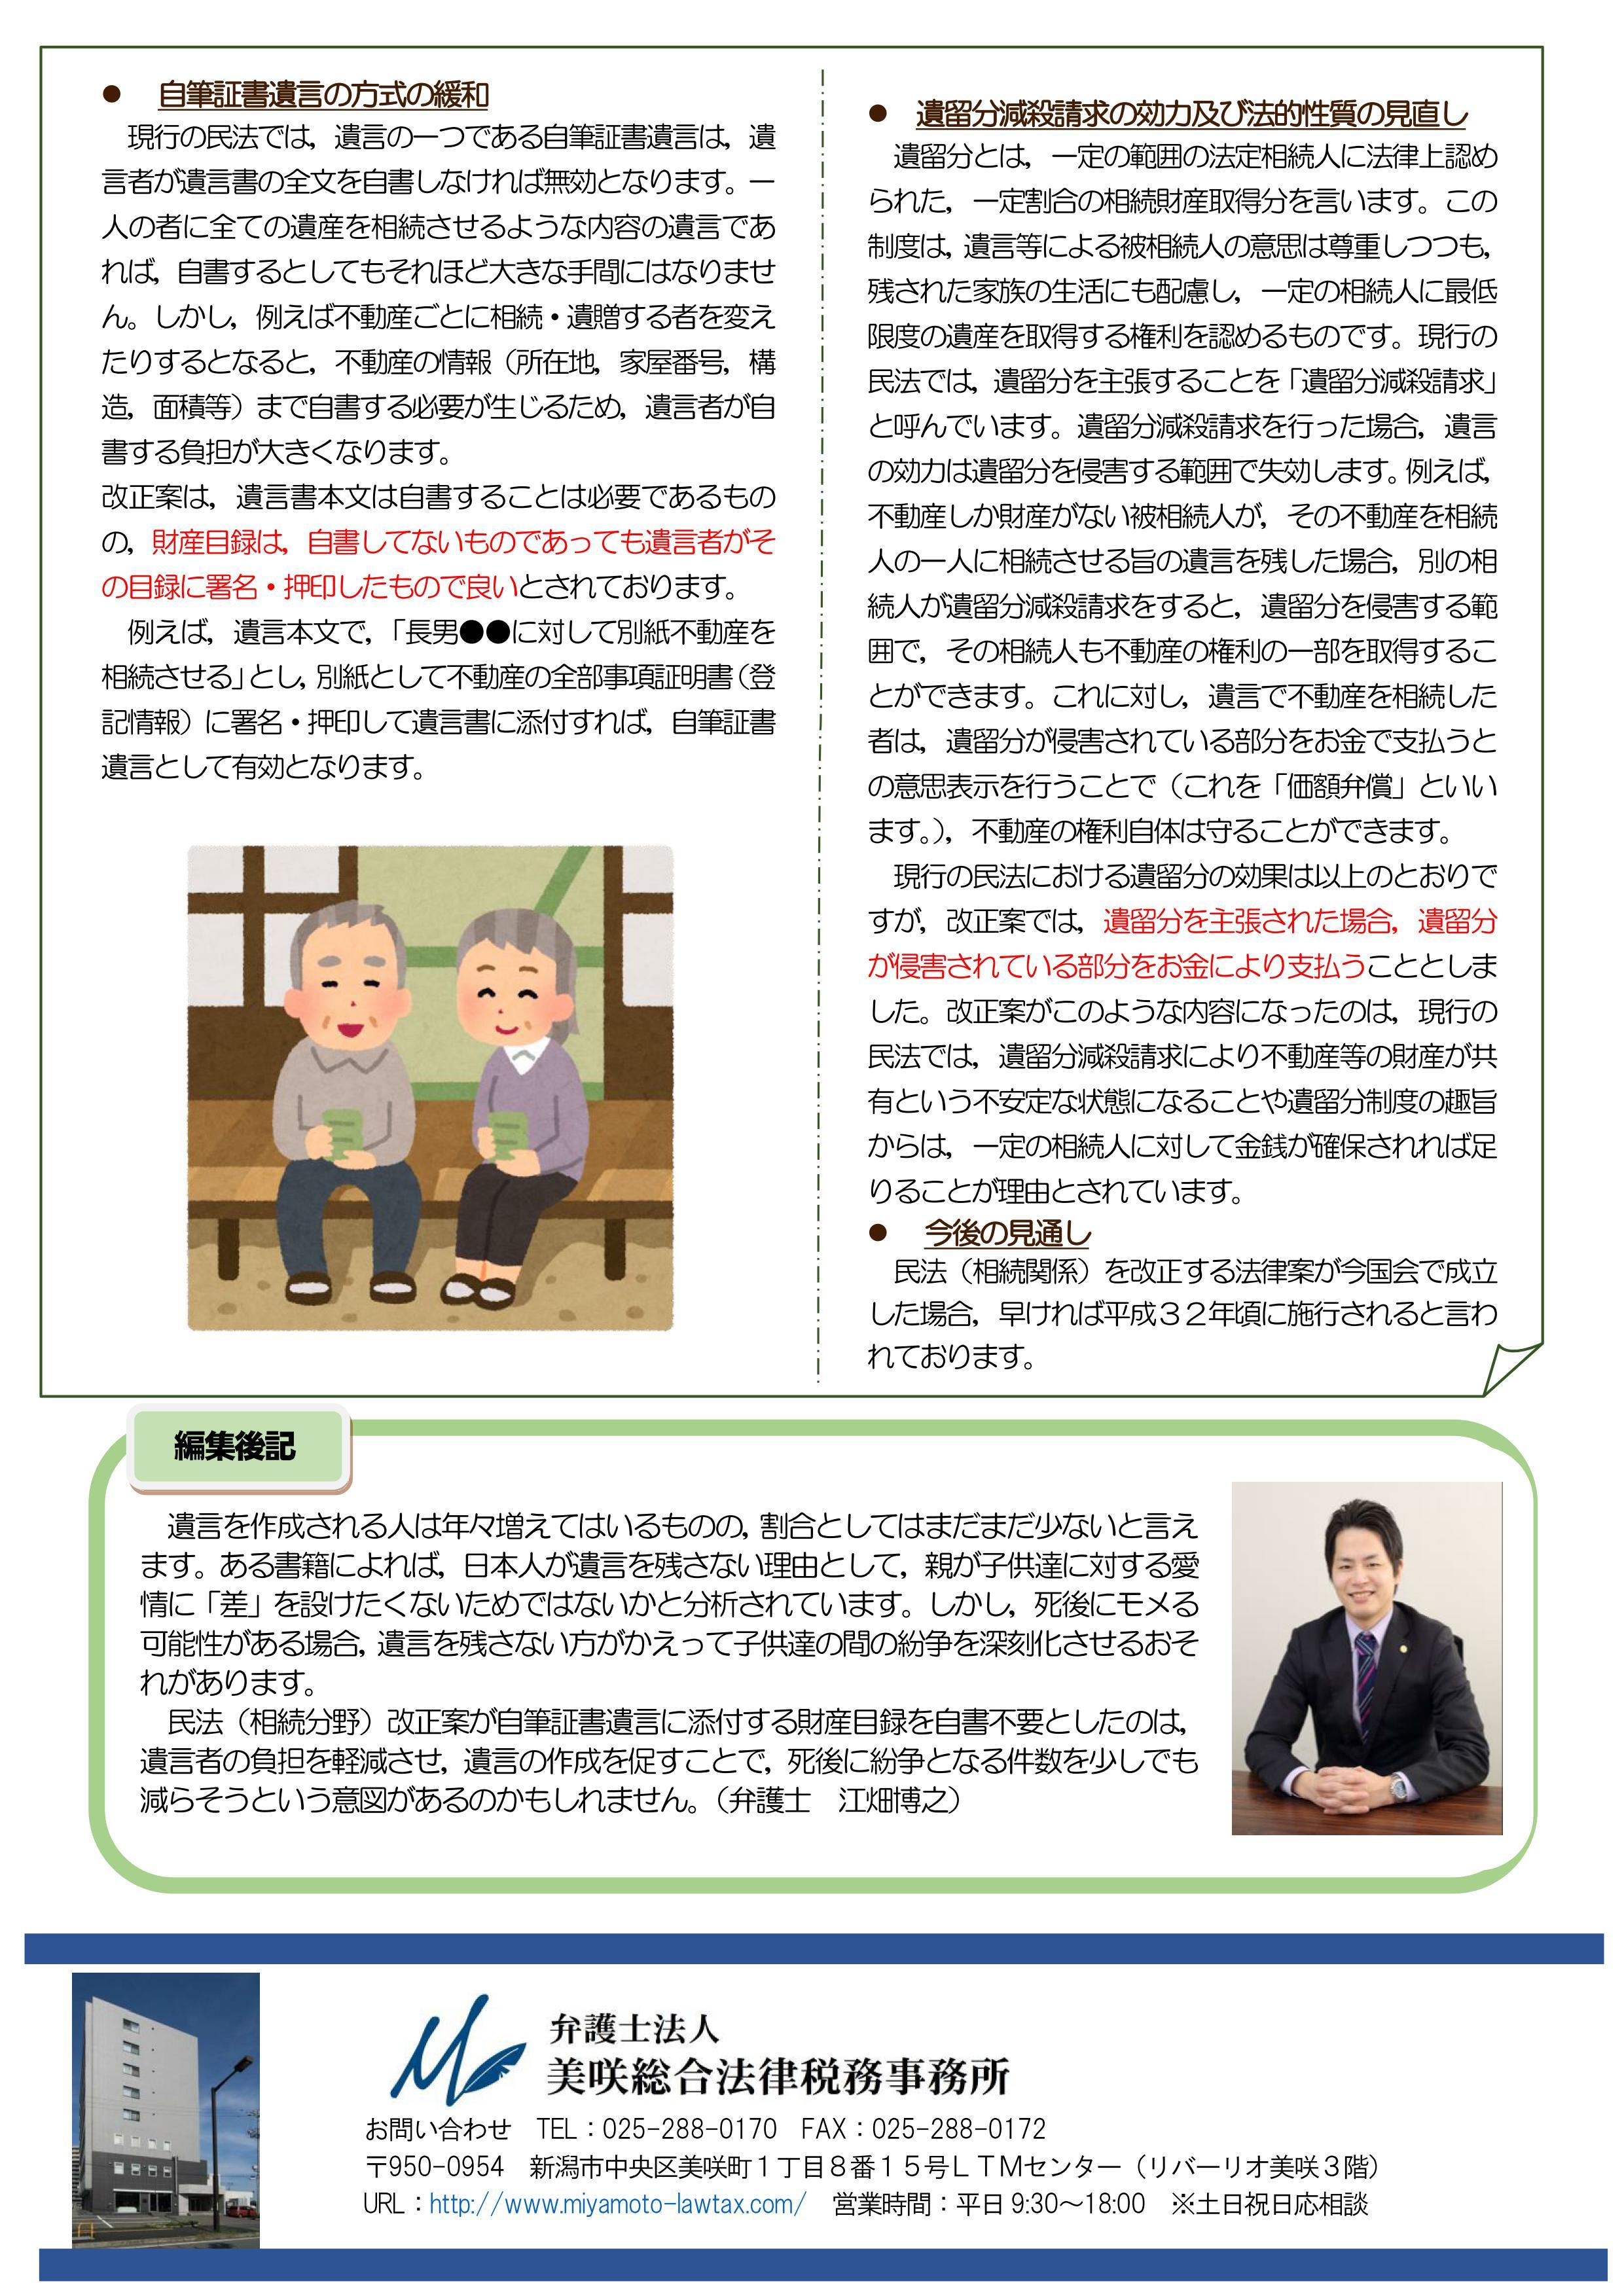 H300403 ニュースレター_Vol.14_02.jpg